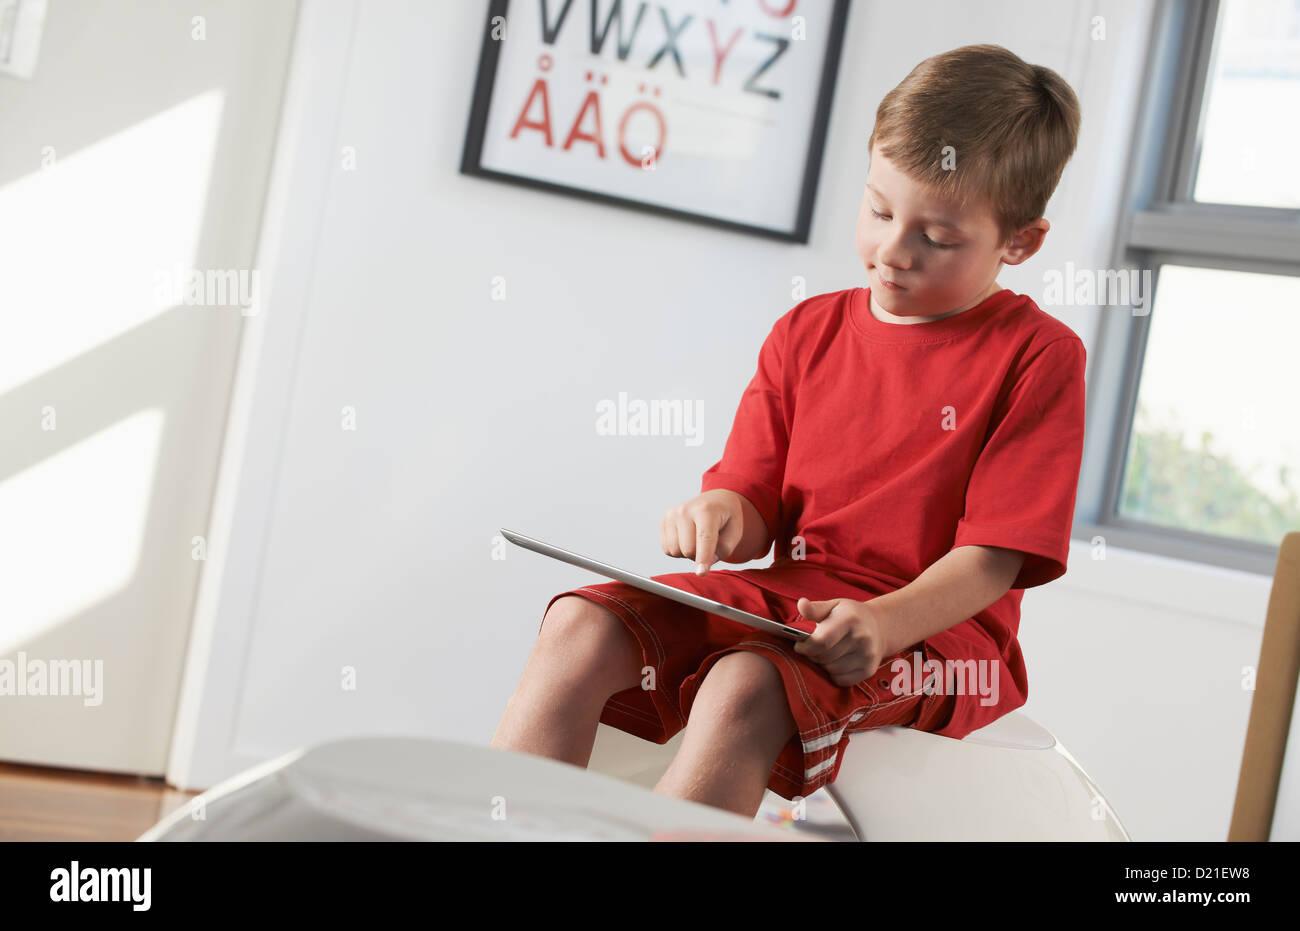 Young boy using ipad at home - Stock Image